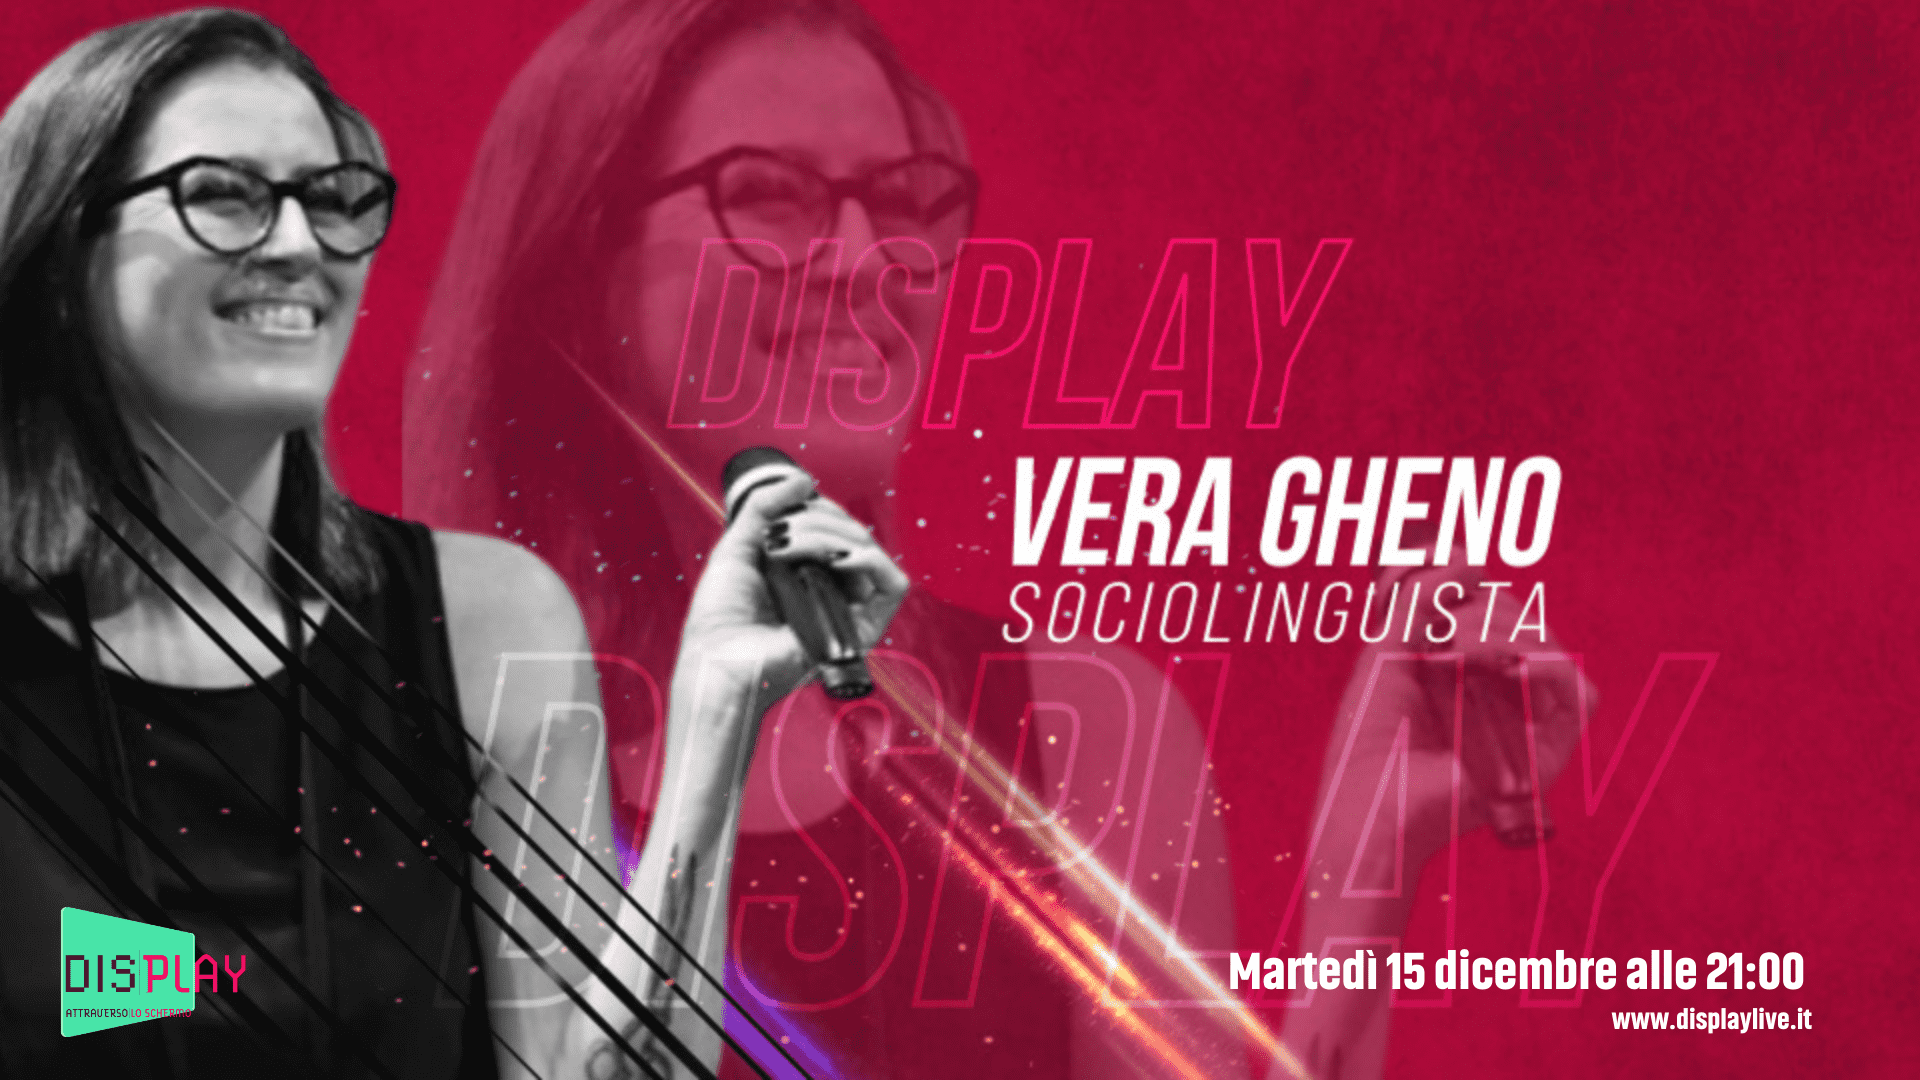 vera-gheno-display